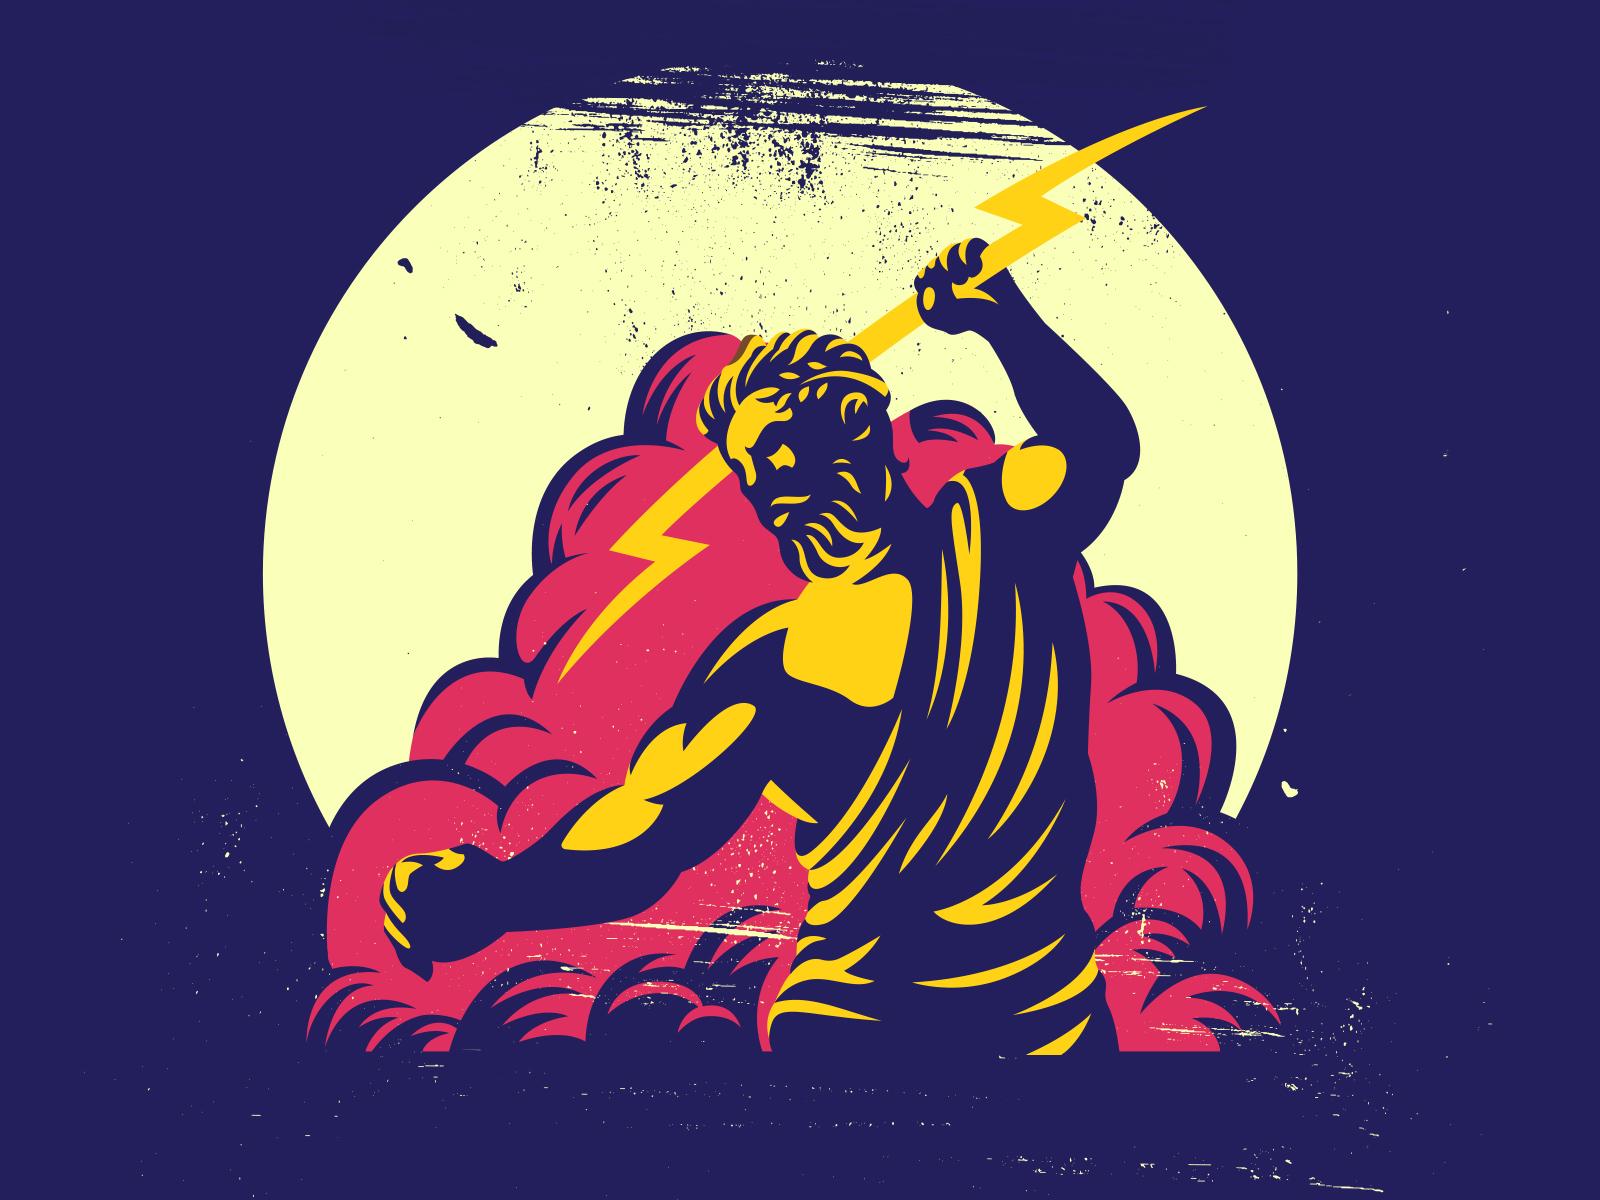 Zeus Hold Lightning Bolt Logo By Rahmad Kurniawan On Dribbble